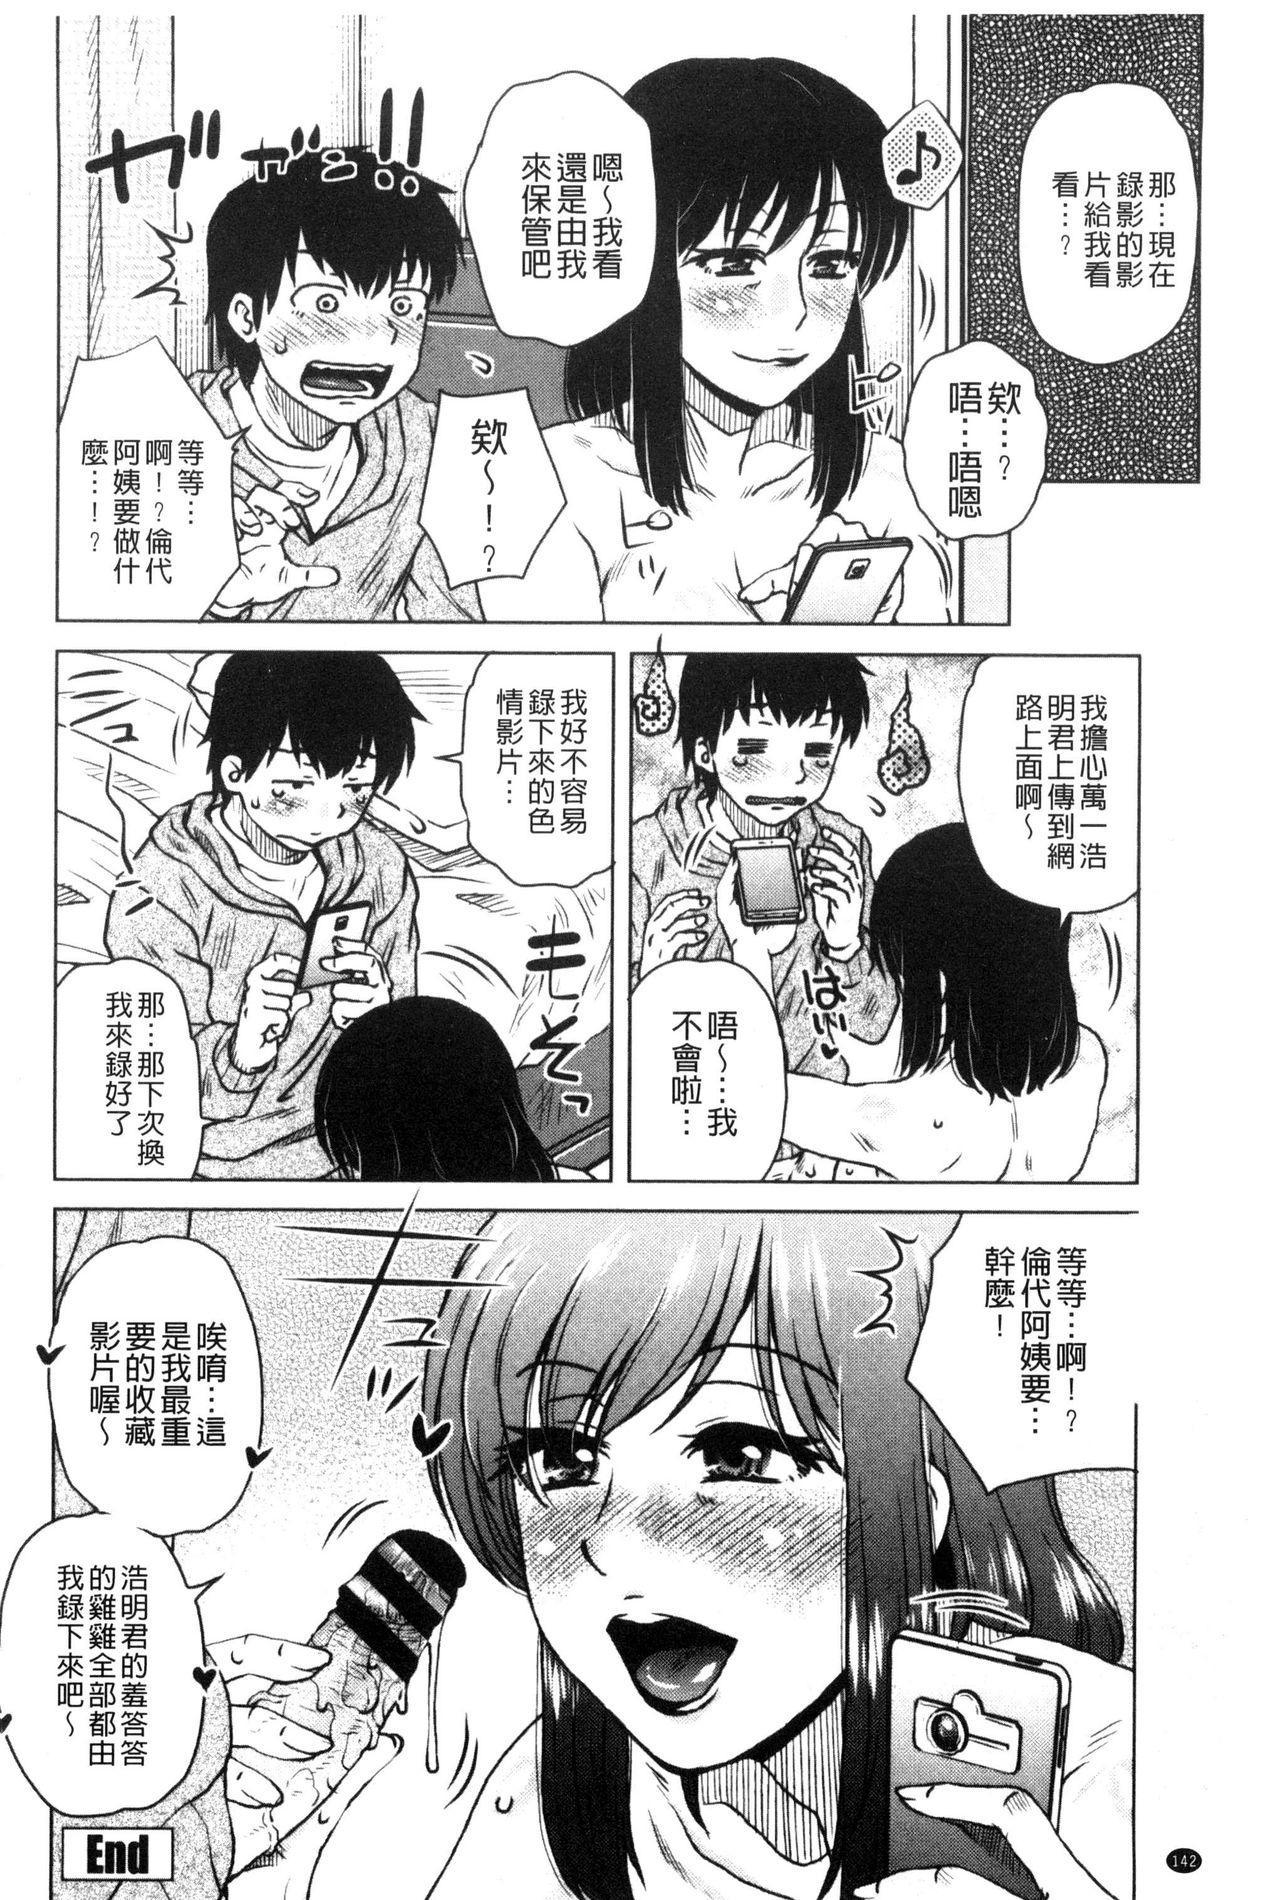 [Kurumiya Mashimin] Uchi no Shachou no Hamedere Inkatsu - Our President is HAME-DERE in Licentious sex life. [Chinese] 146